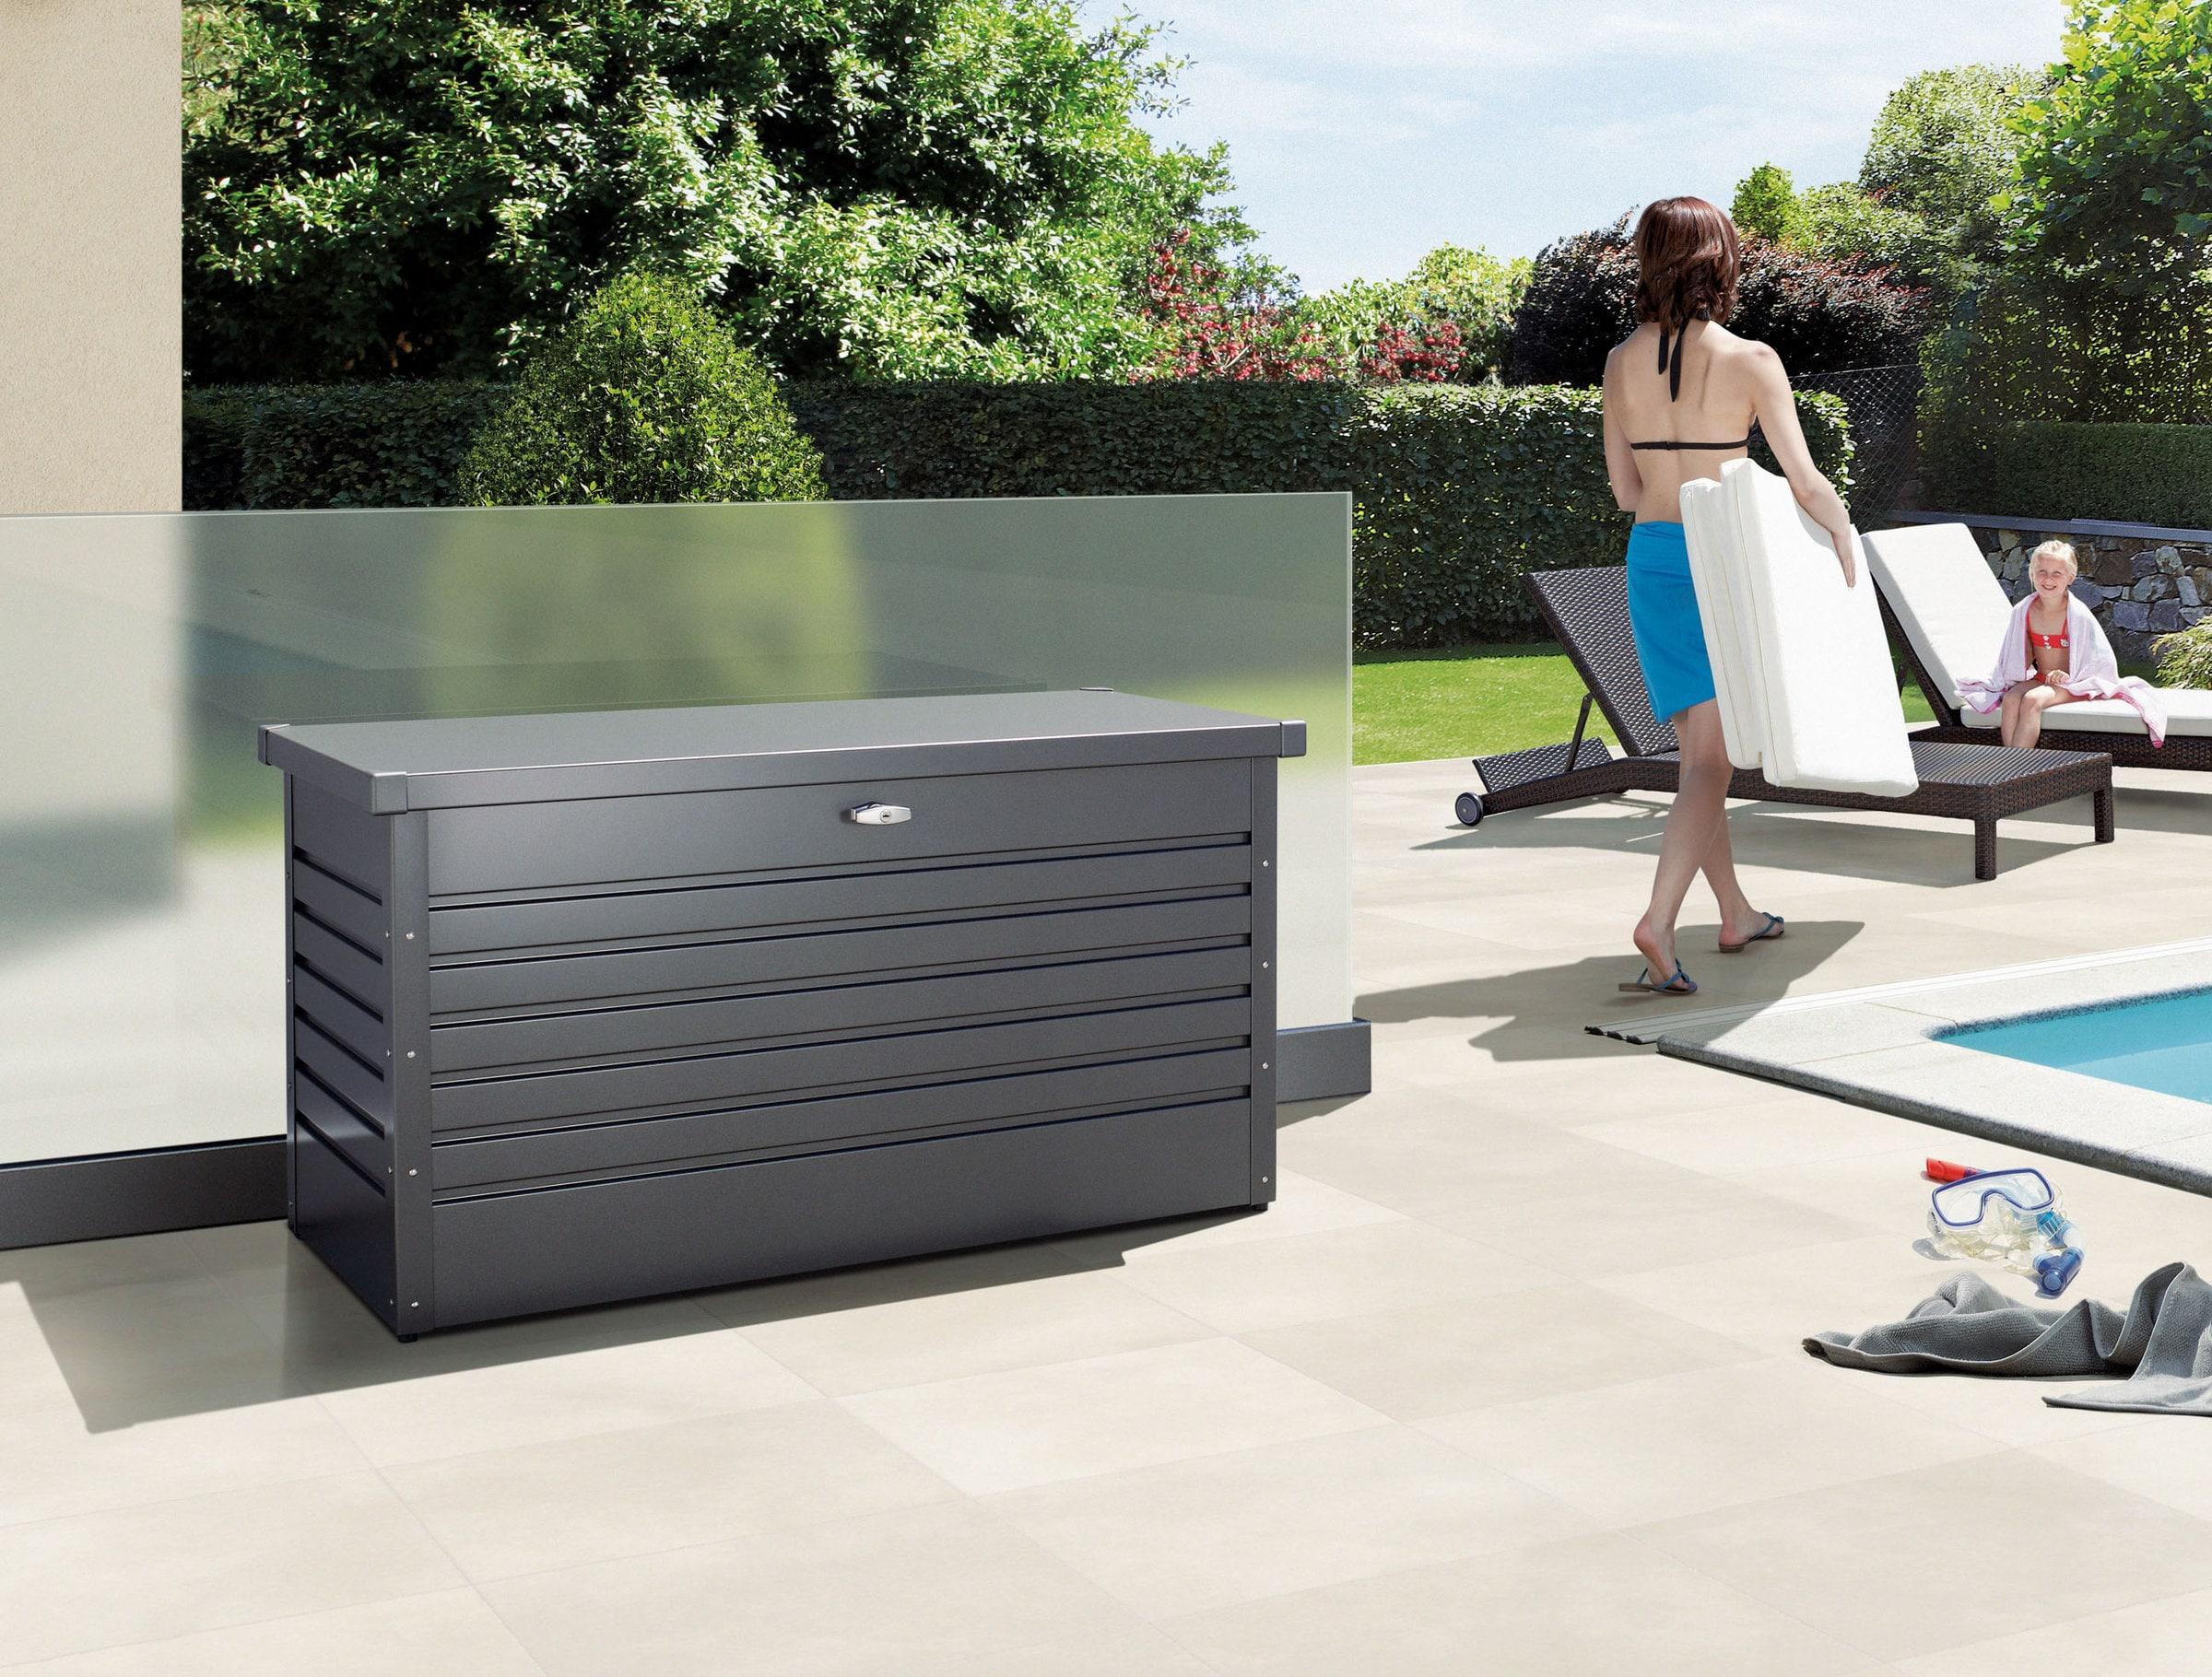 biohort freizeitbox 180 migros. Black Bedroom Furniture Sets. Home Design Ideas